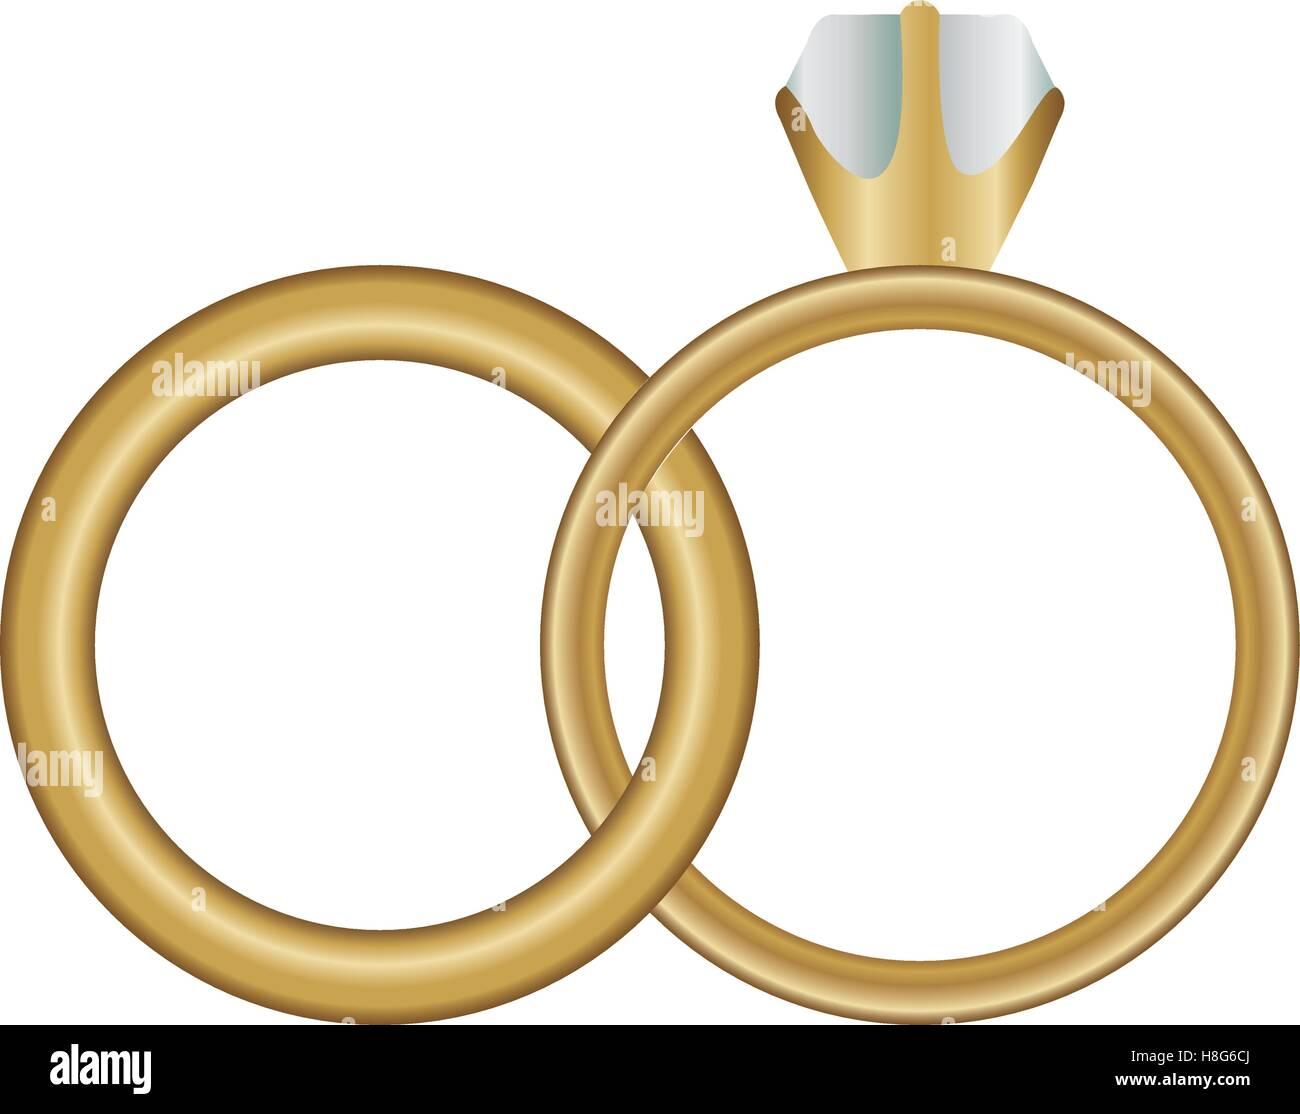 engagement ring icon image vector illustration design ...